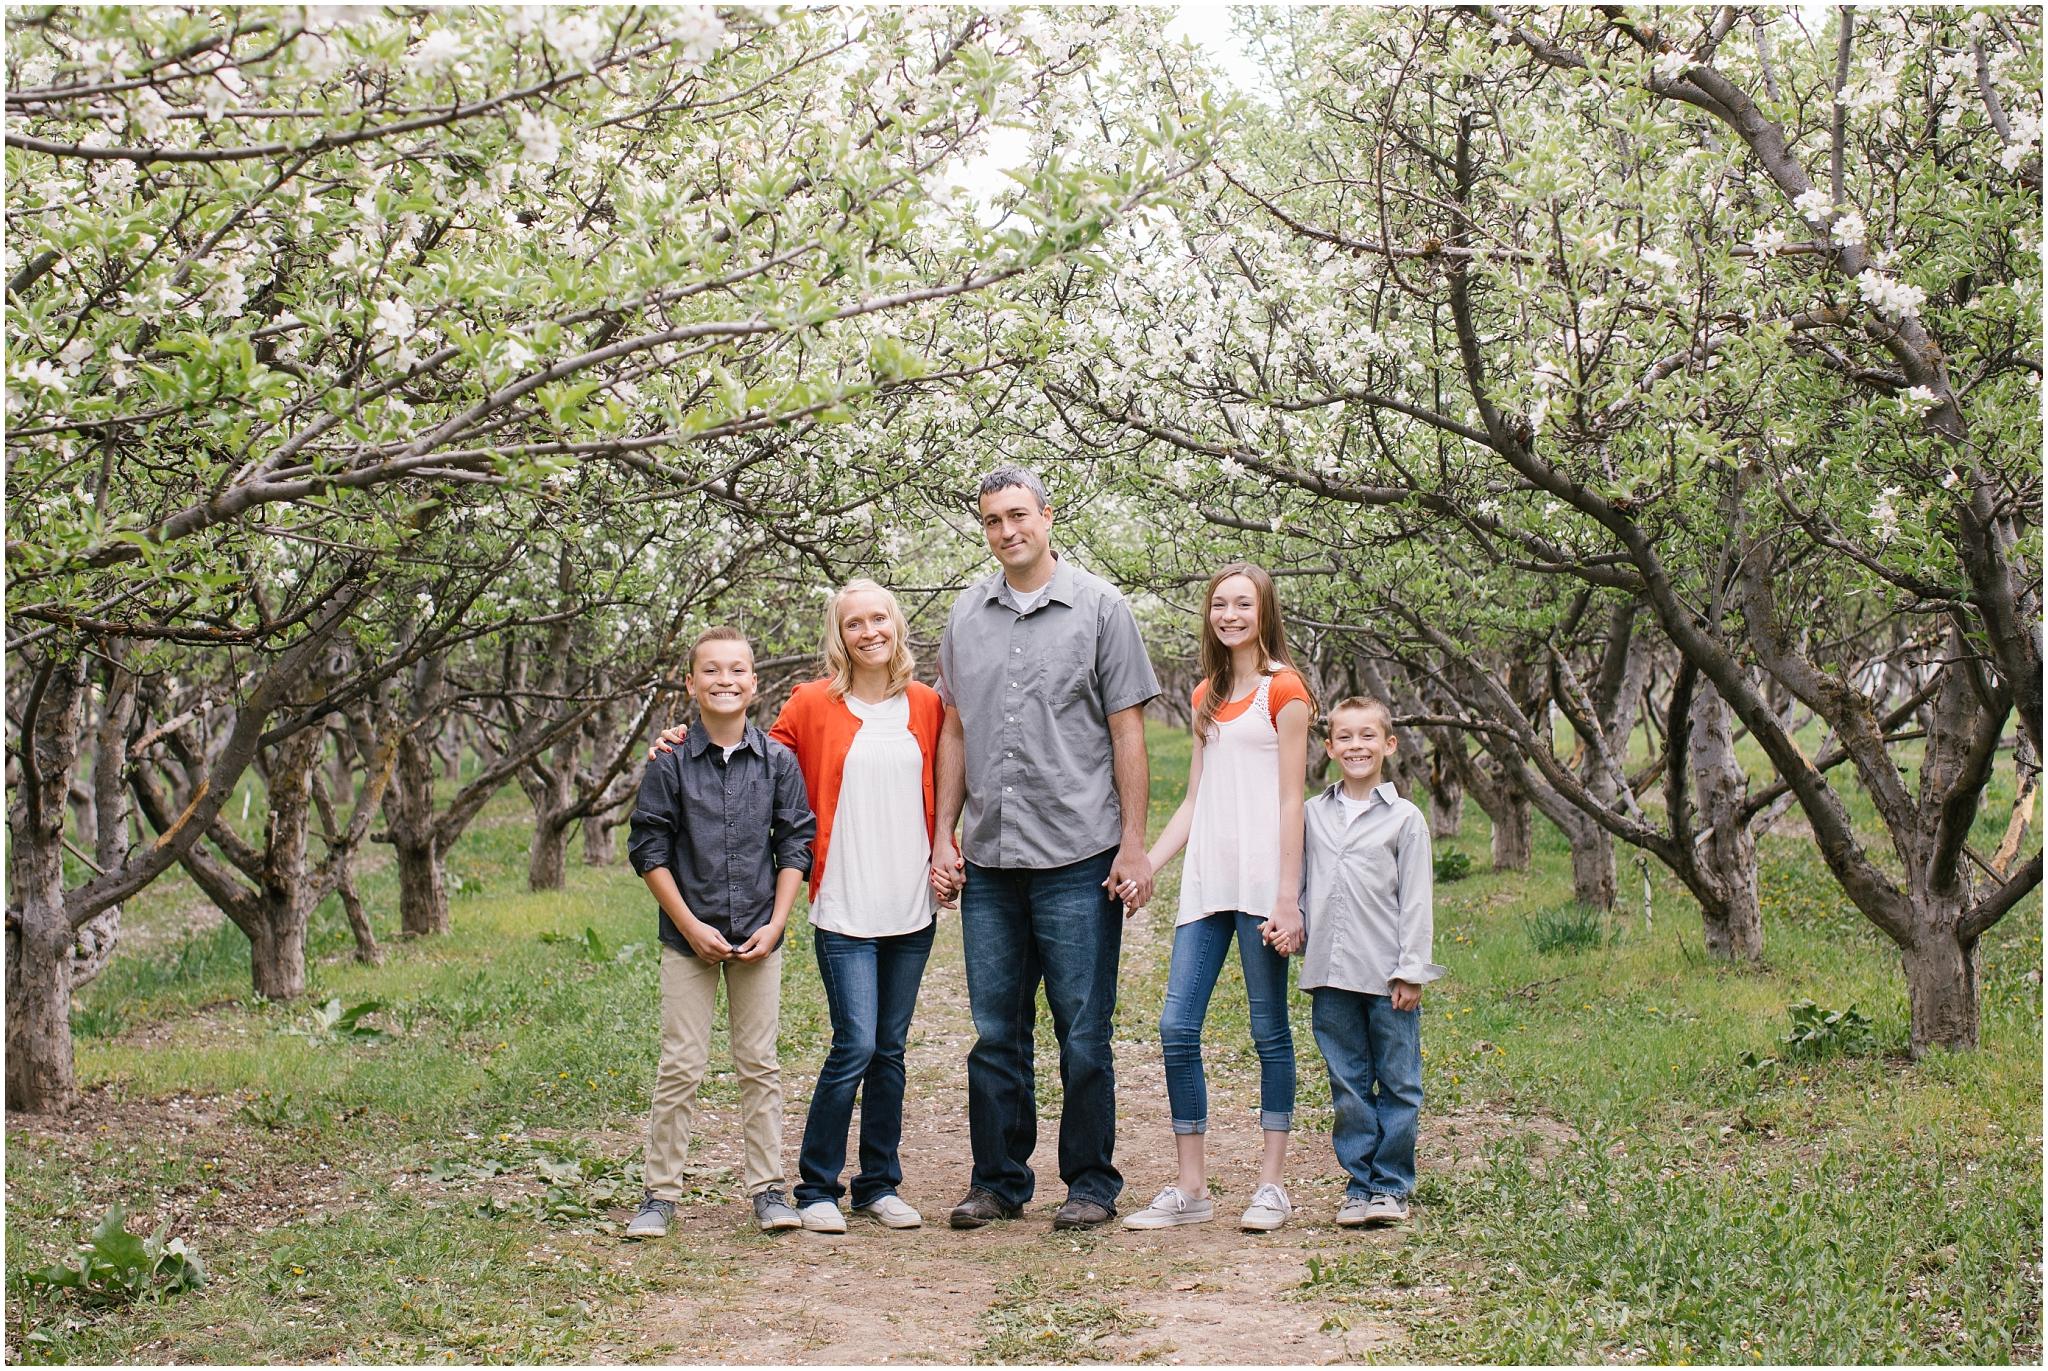 Millar-25_Lizzie-B-Imagery-Utah-Family-Photographer-Salt-Lake-City-Park-City-utah-state-hospital.jpg